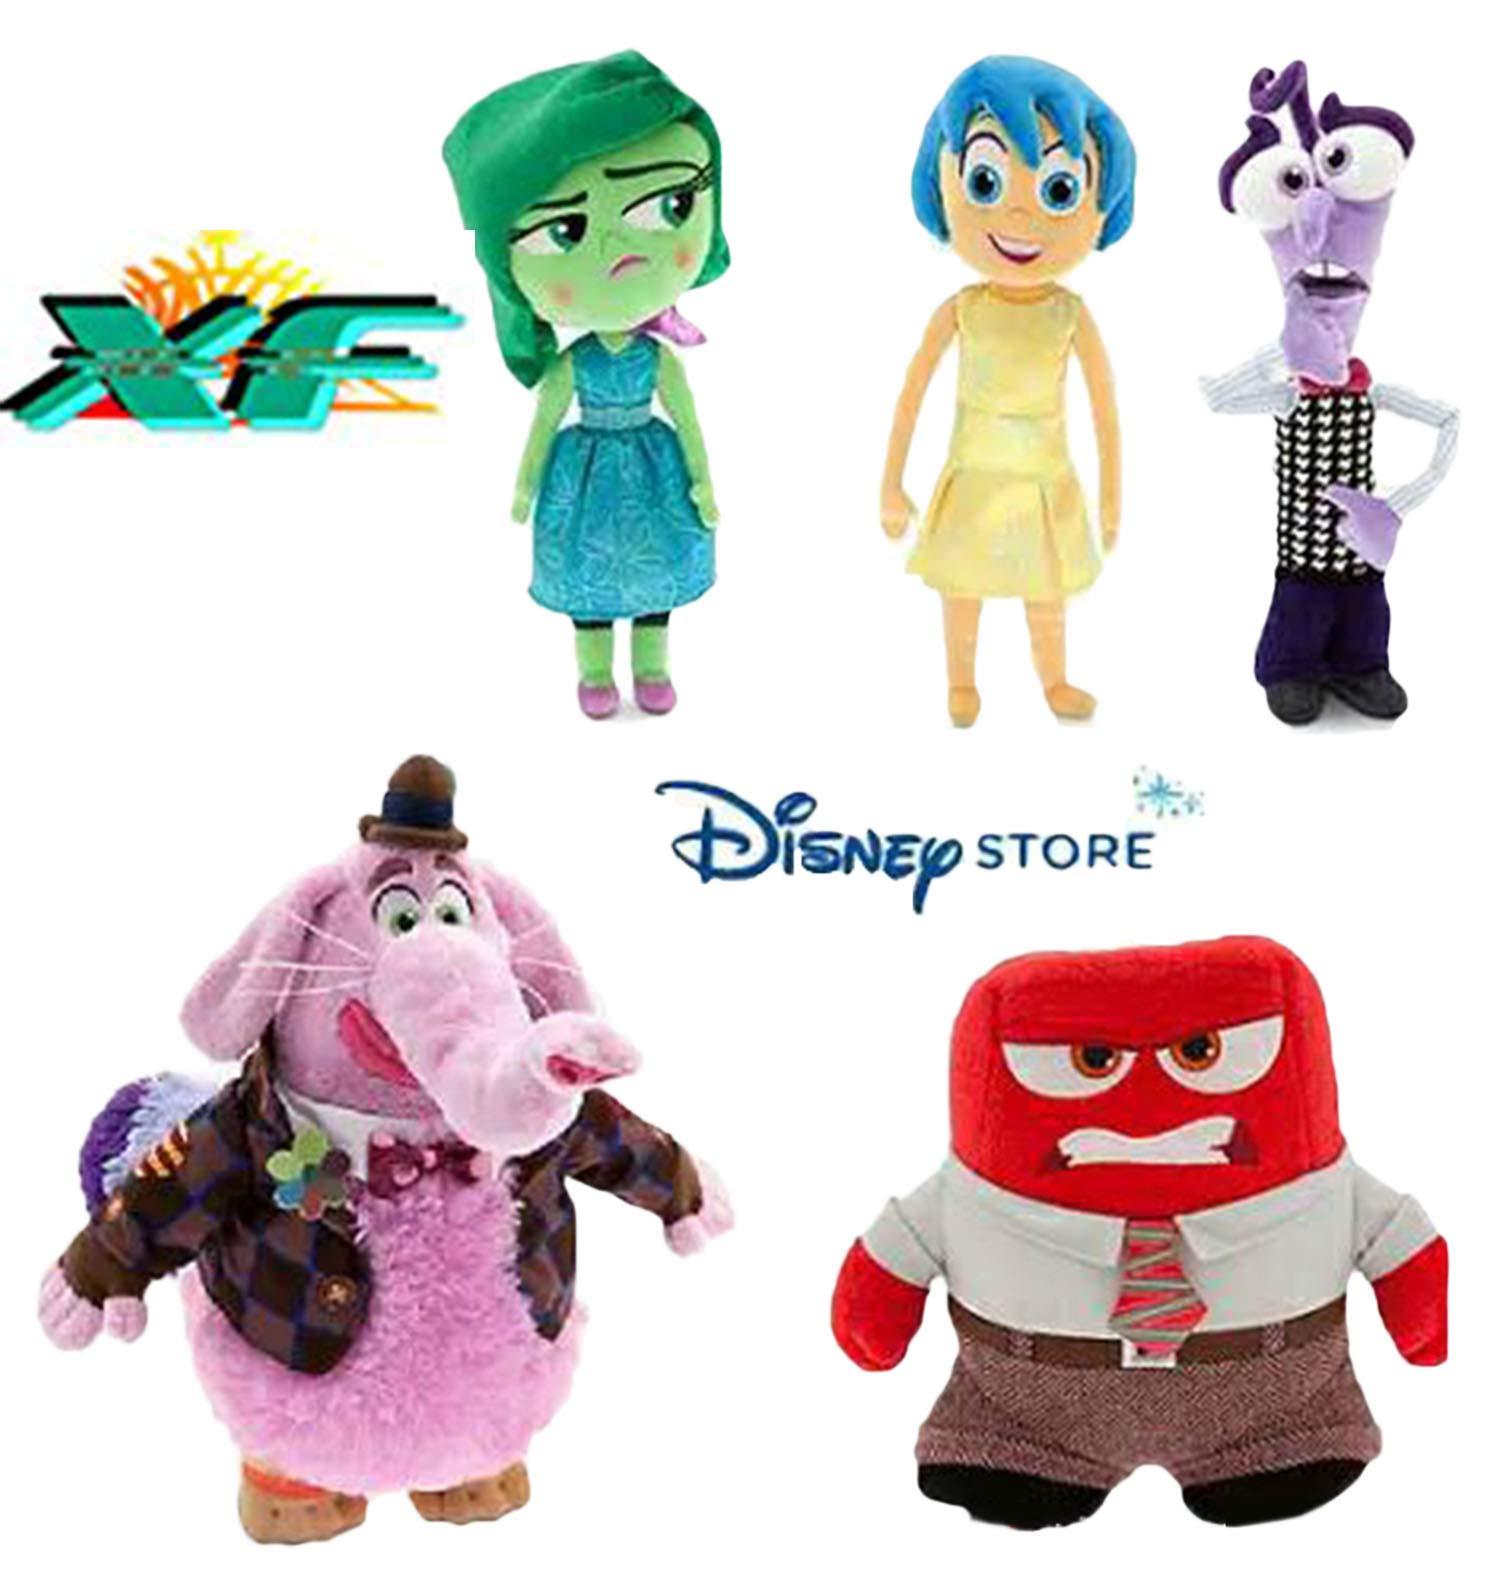 TalentPZ® Vividlike eco-Friendly Halloween Christmas Birthday Gift Children Kids 5 Pieces Inside Out Stuffed Puppet Dolls Plush Toys Set 5 Small (Height:13-23cm / 5.12-7.88'')